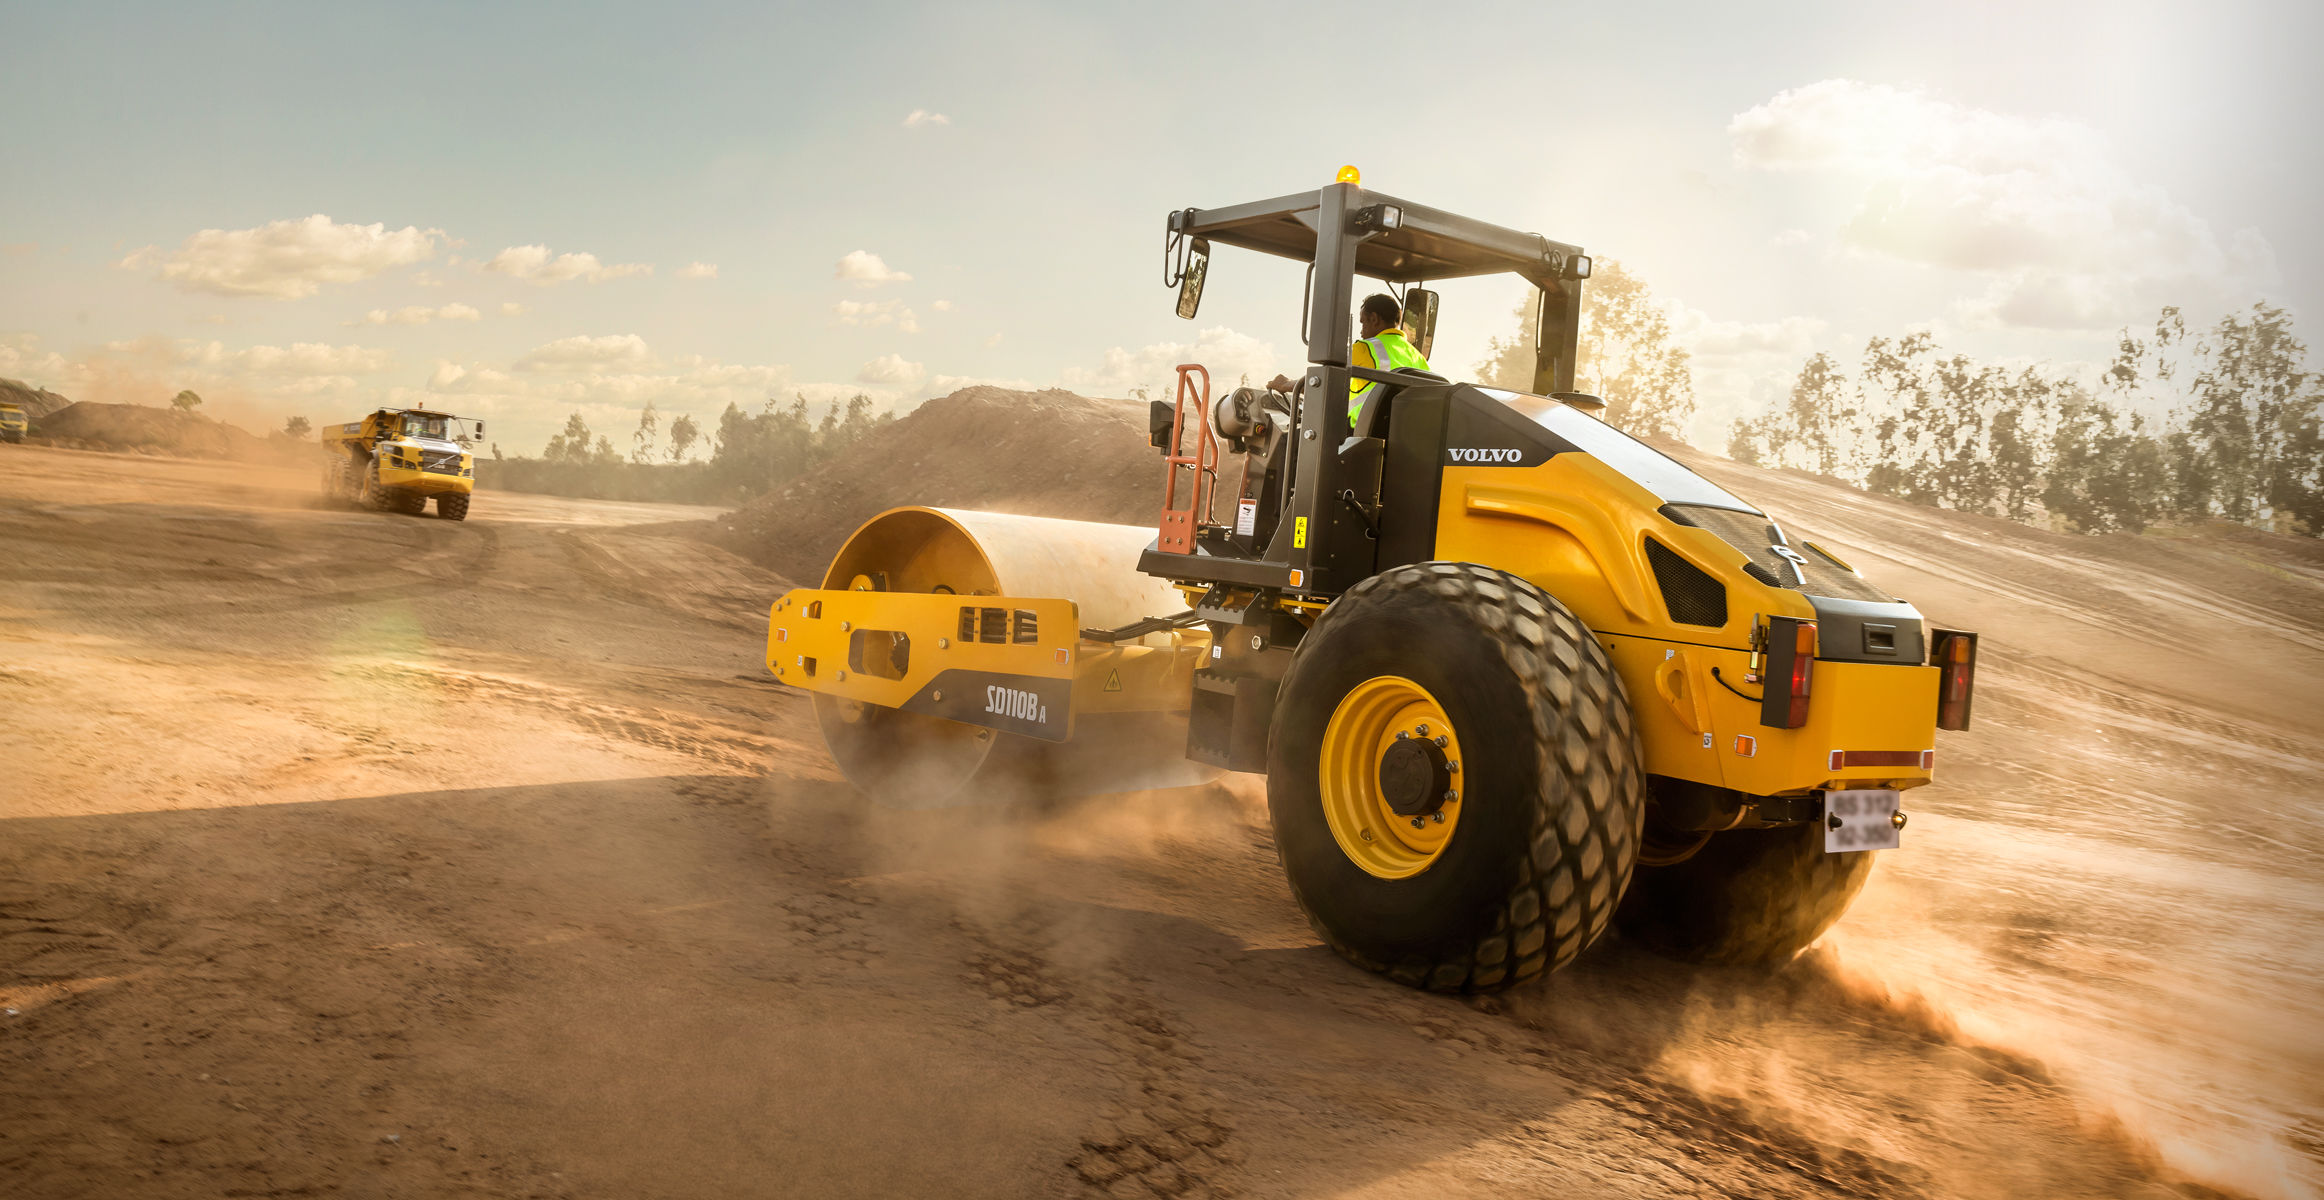 SD110BA | Soil compactors | Durable by design | Volvo Construction Equipment